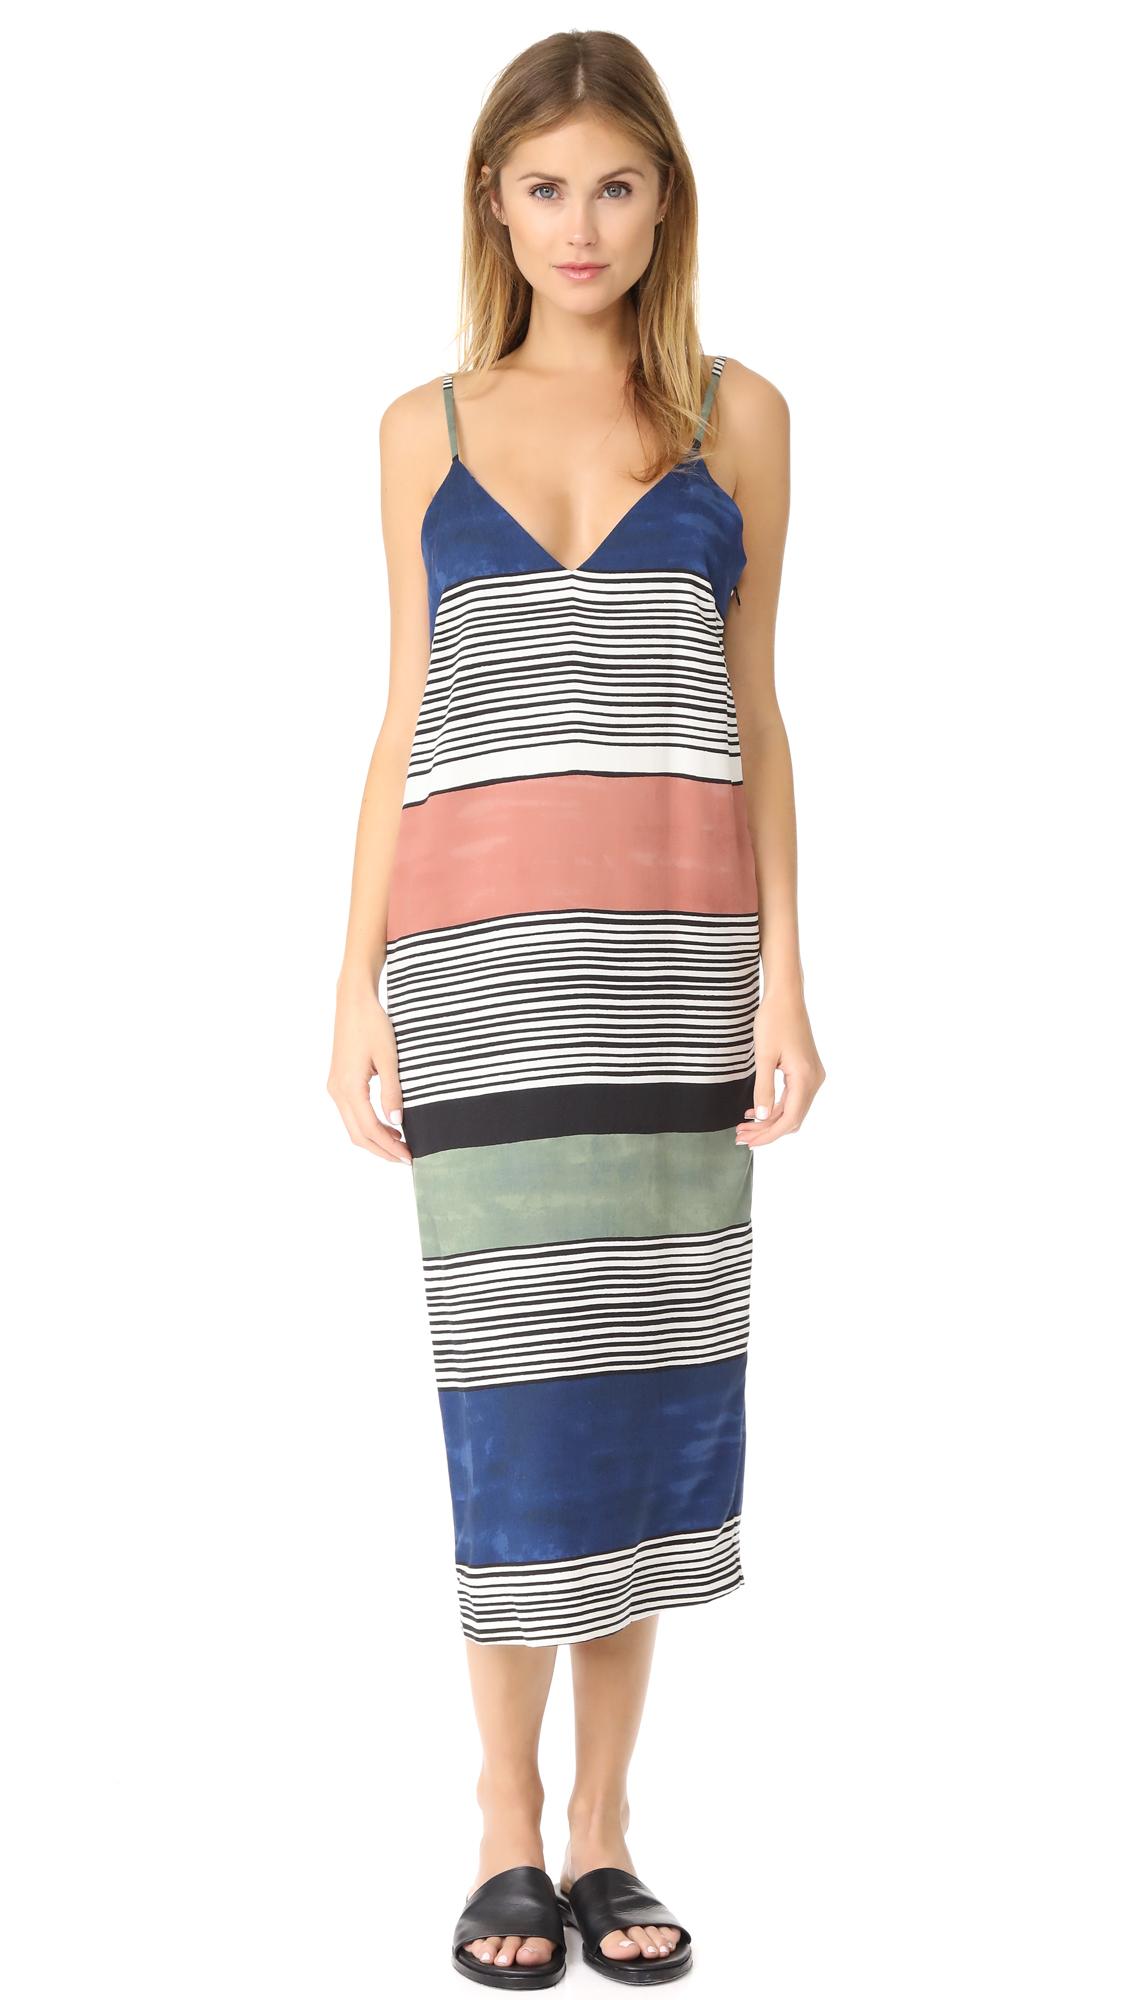 Mara Hoffman Georgia Dress - Navy Multi